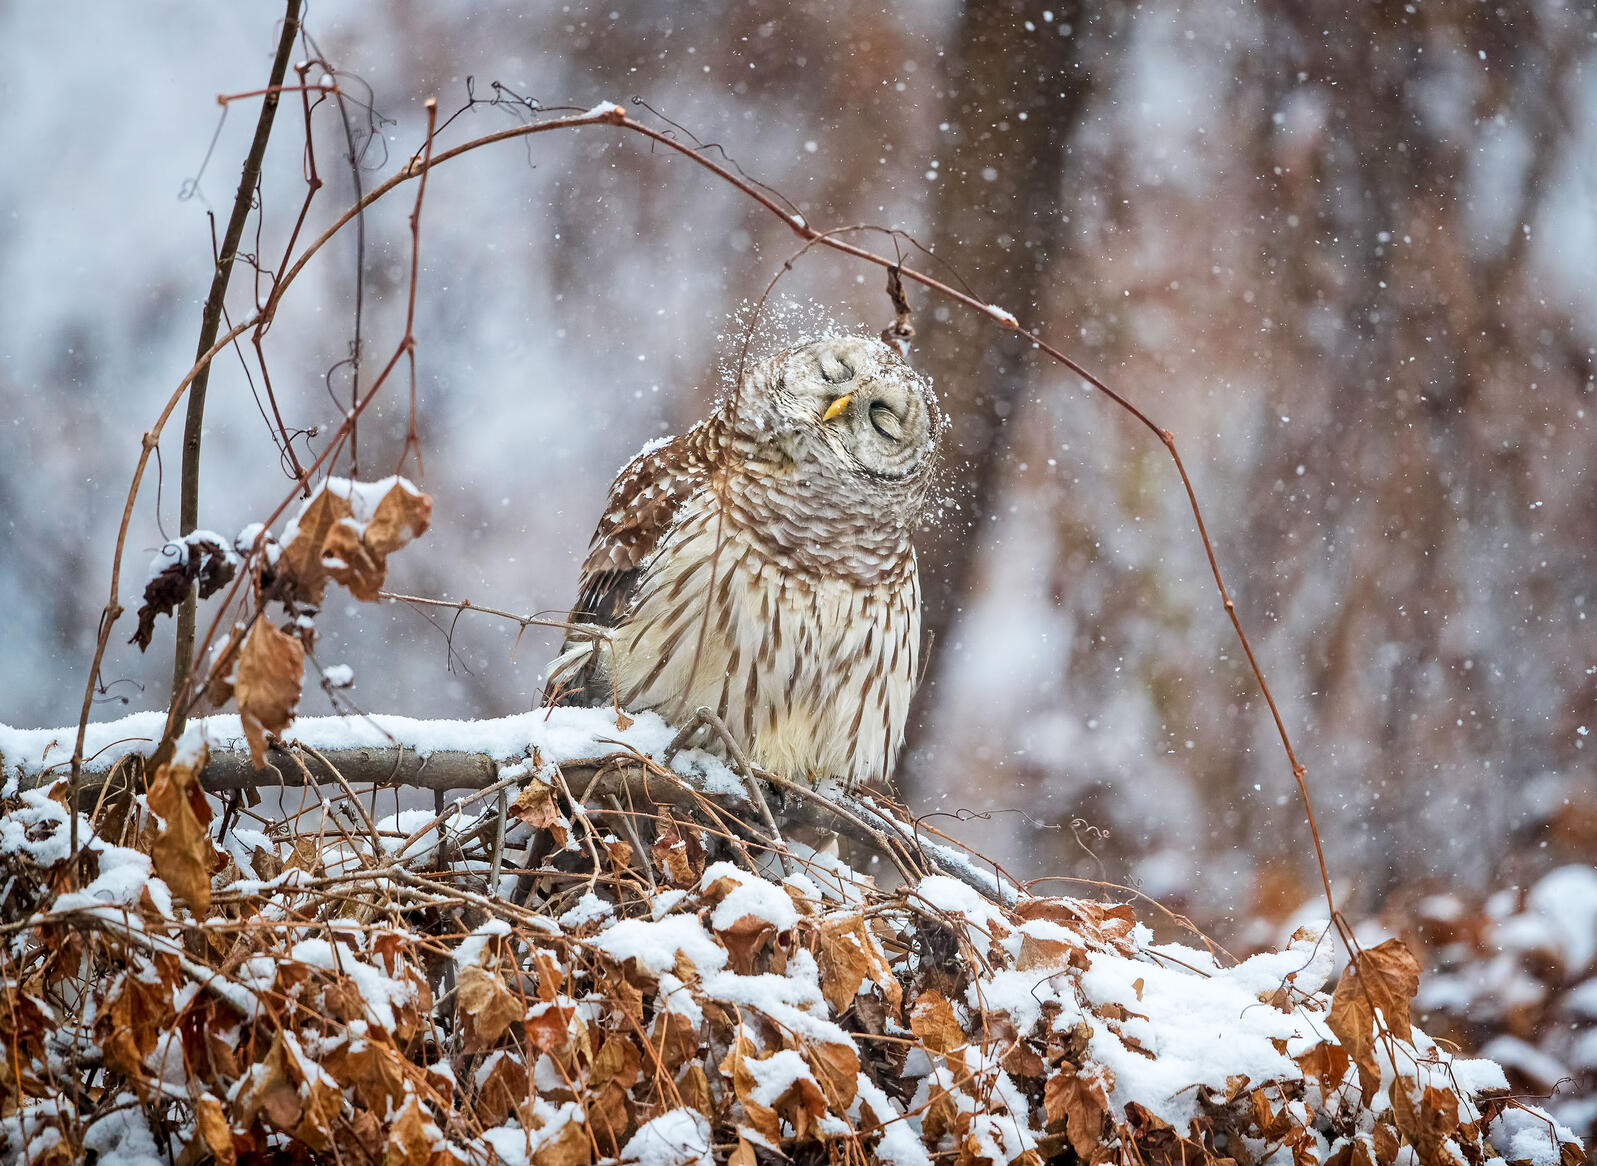 A Barred Owl shakes snow off its feathers. Scott Suriano/Audubon Photography Awards